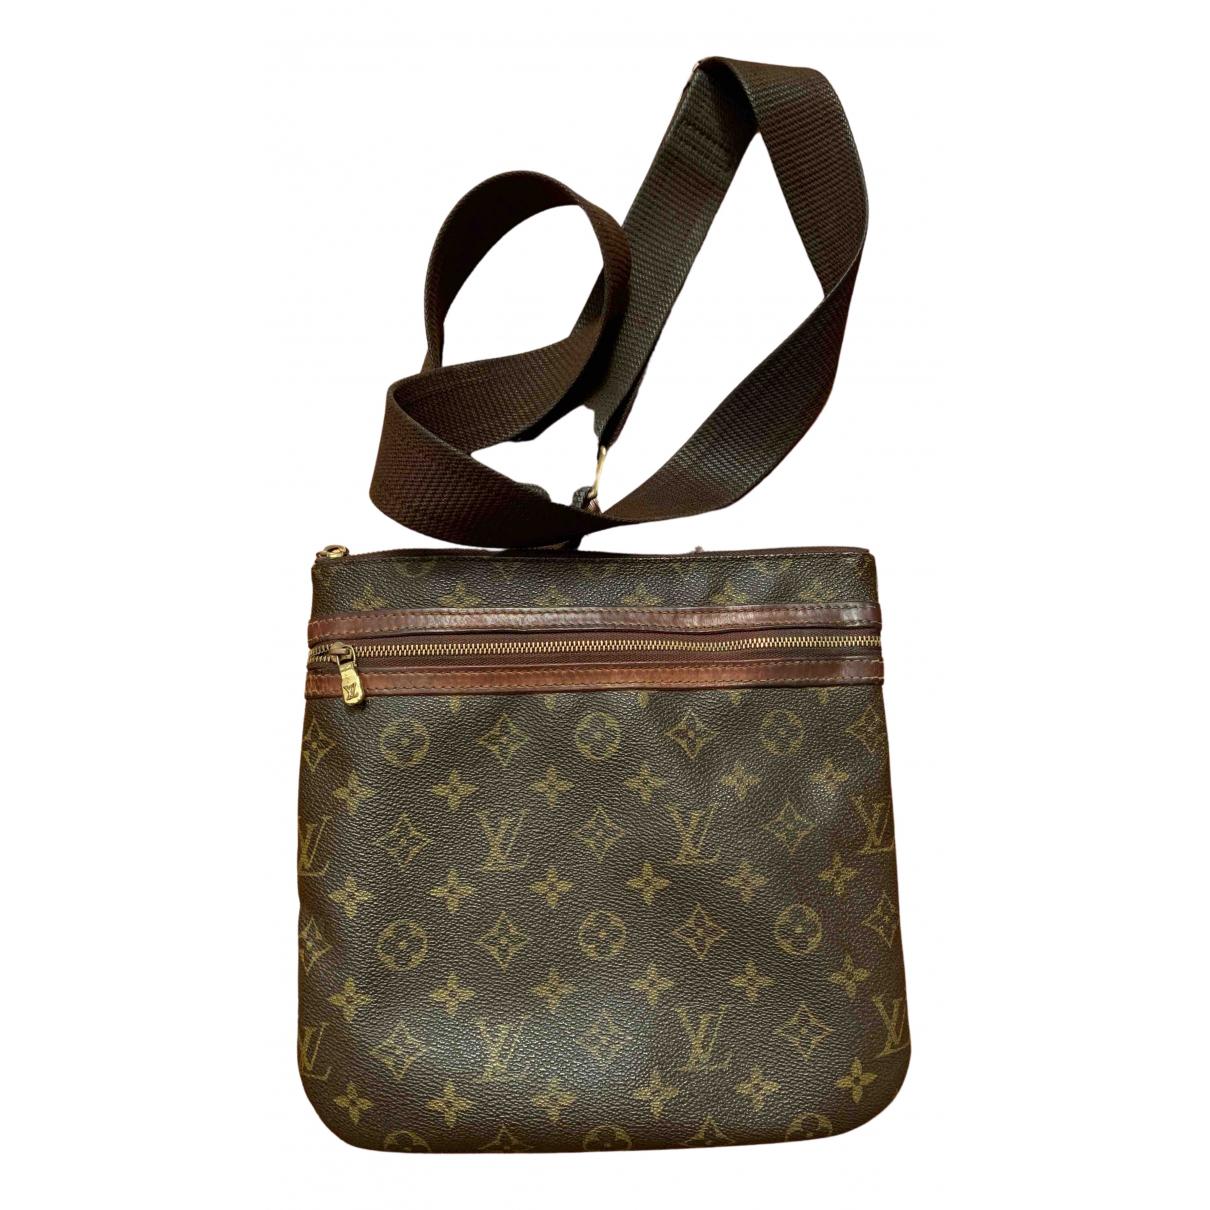 Bolso Bosphore de Lona Louis Vuitton